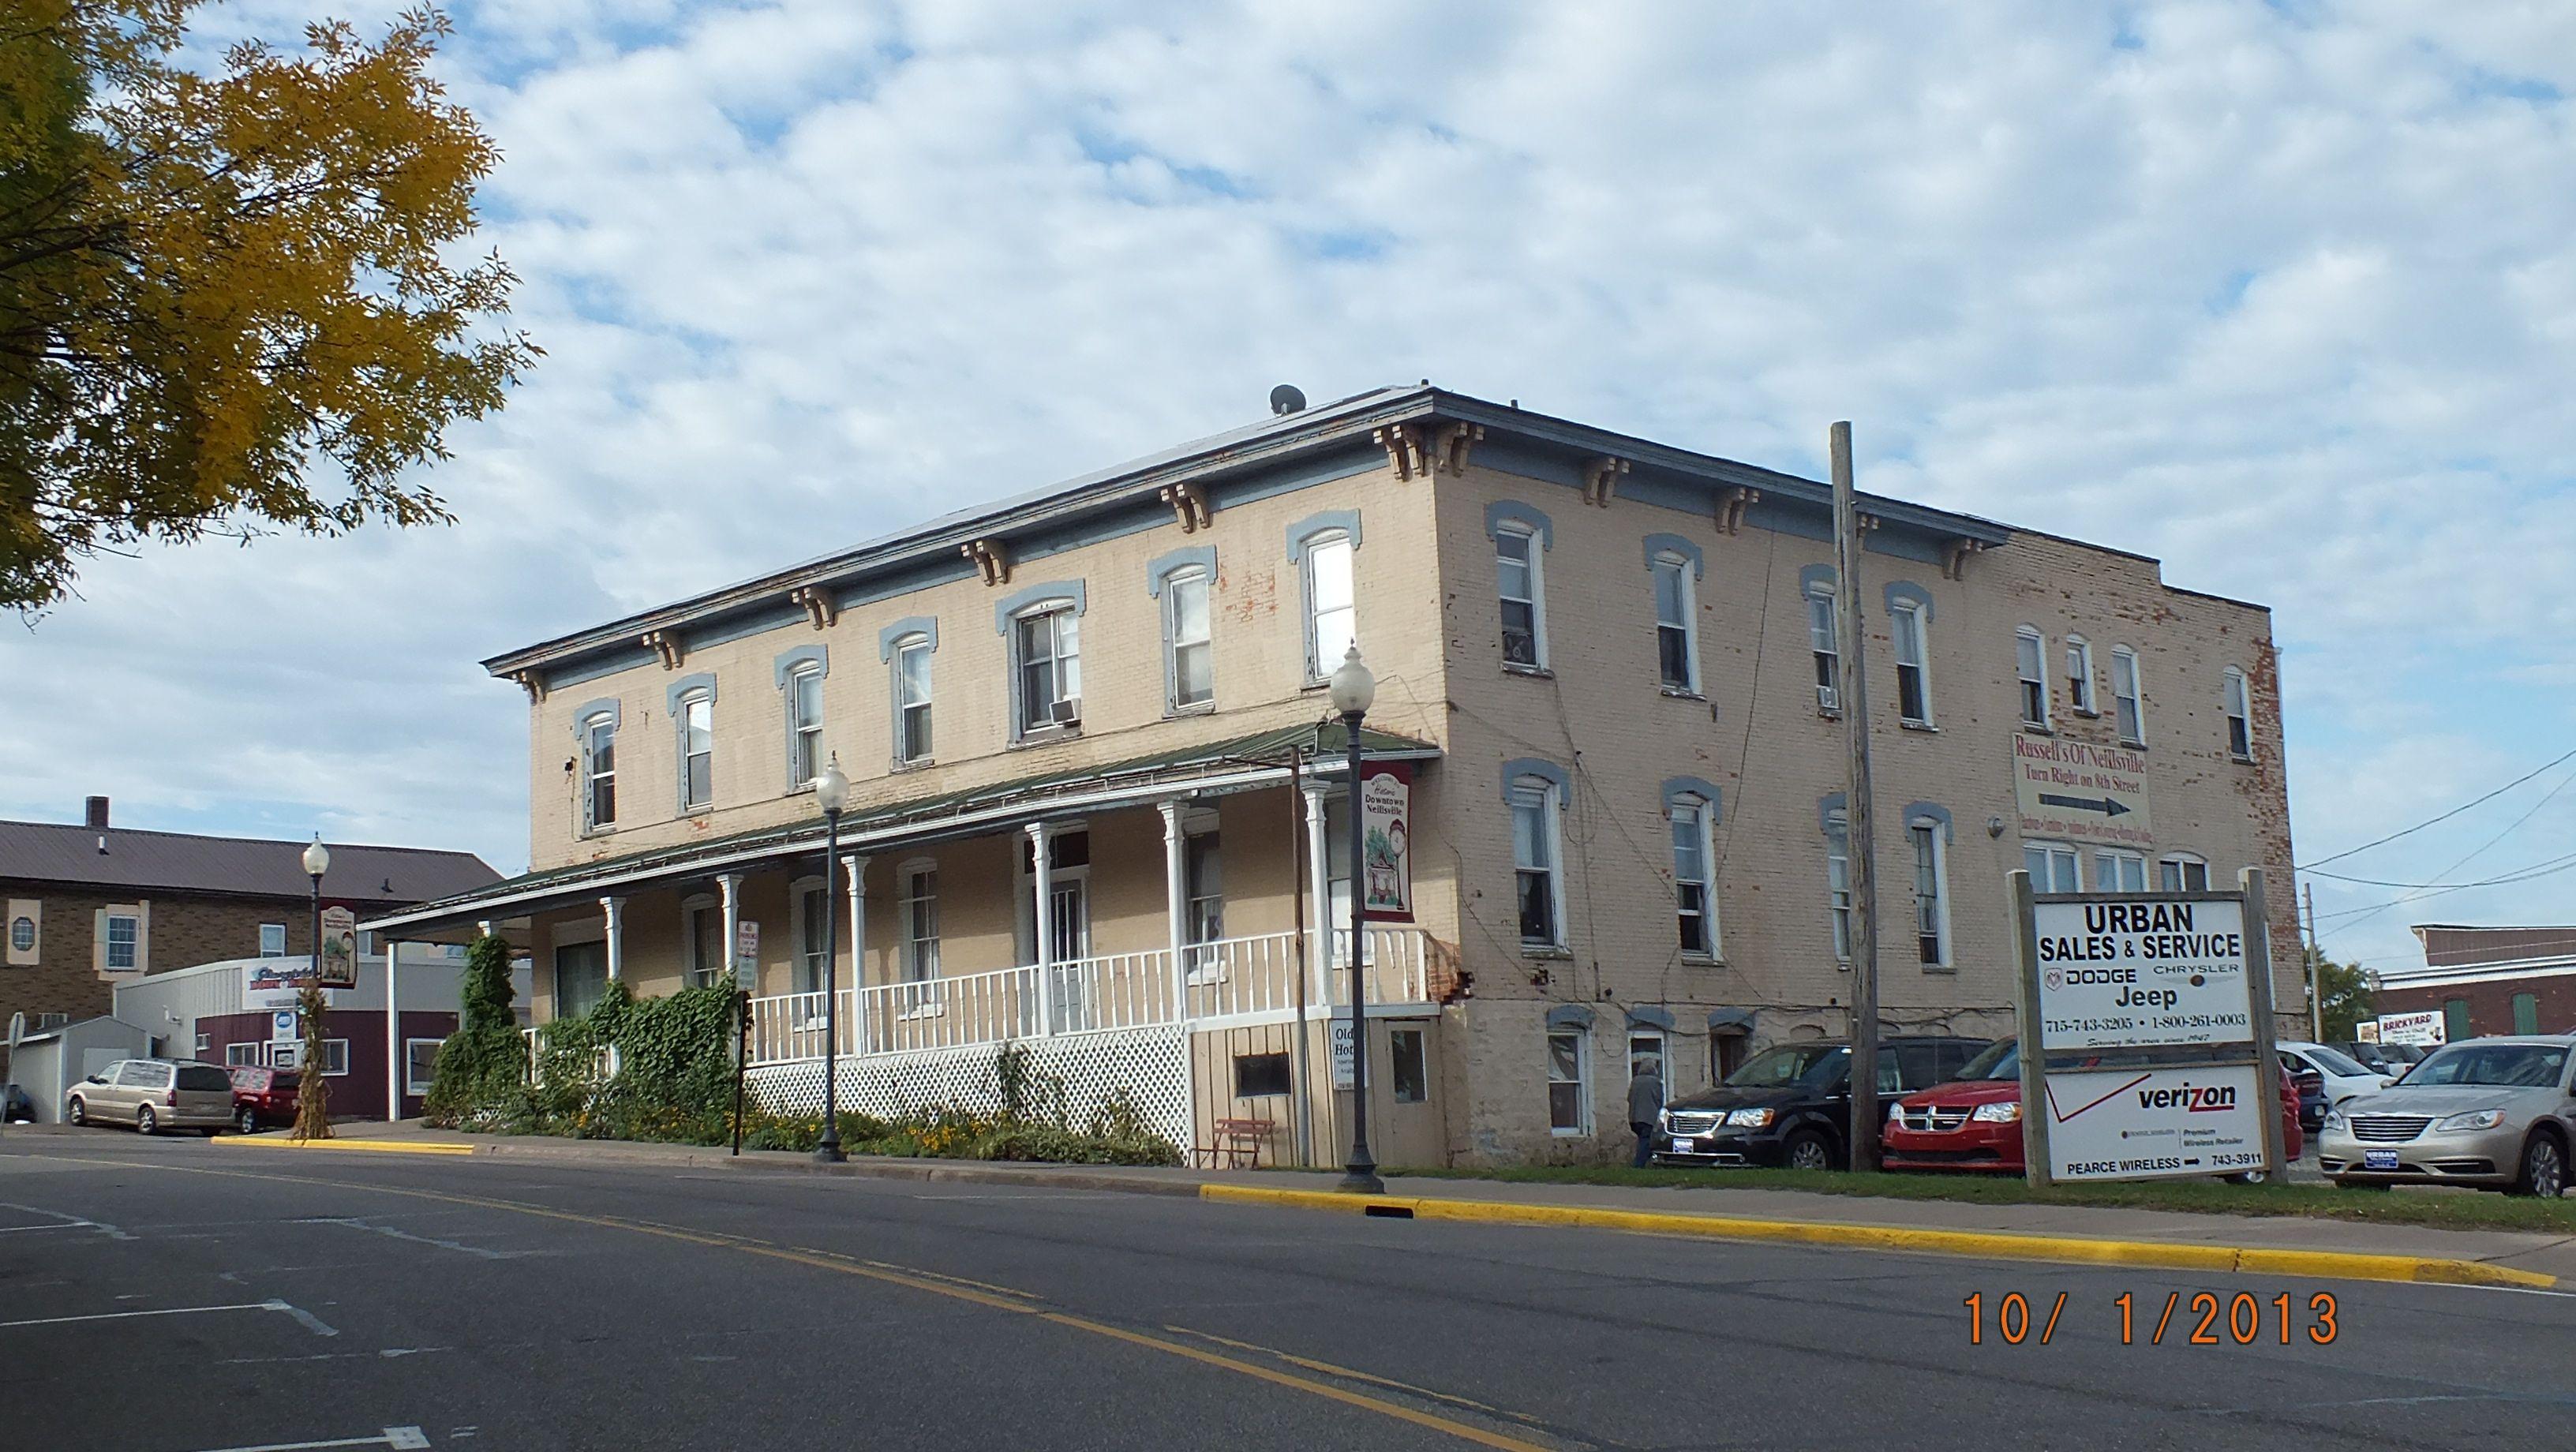 Historic Merchants Hotel Corner Of Hewett And W 7th St Neillsville